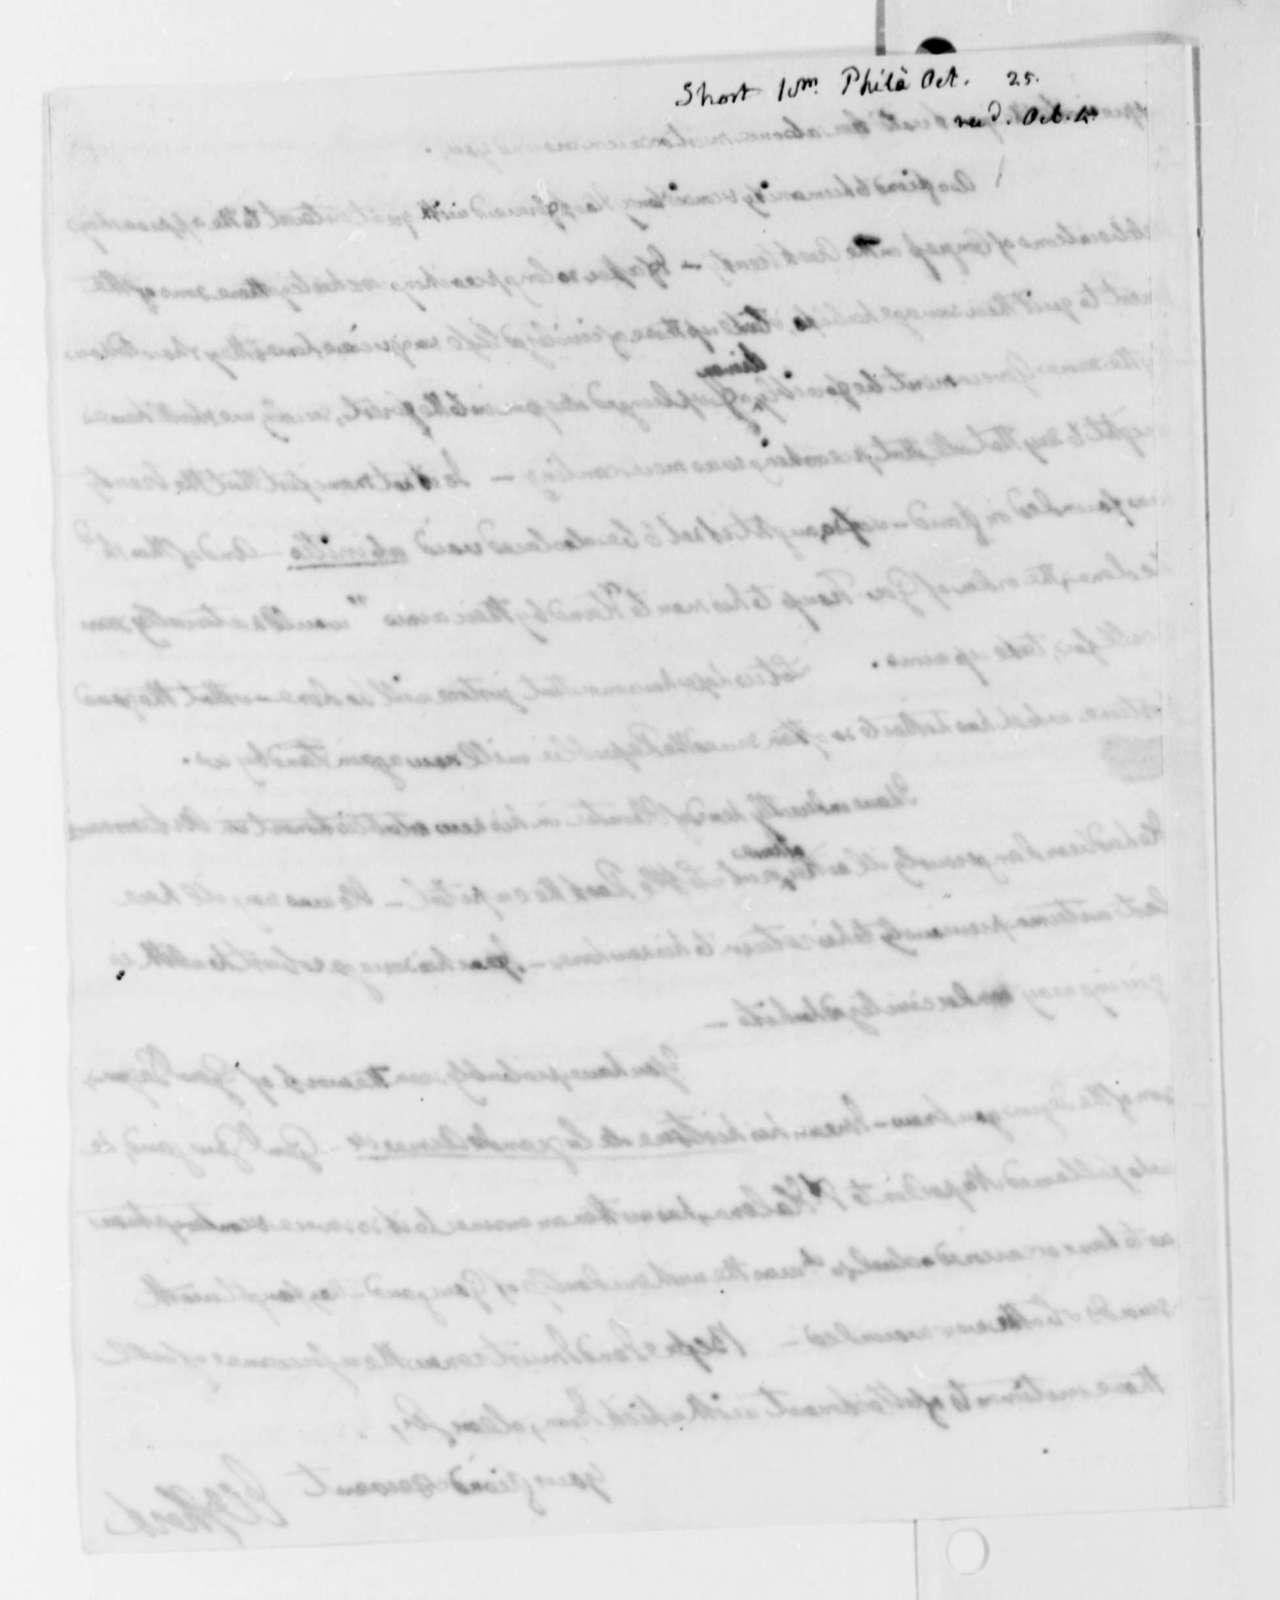 William Short to Thomas Jefferson, October 4, 1825